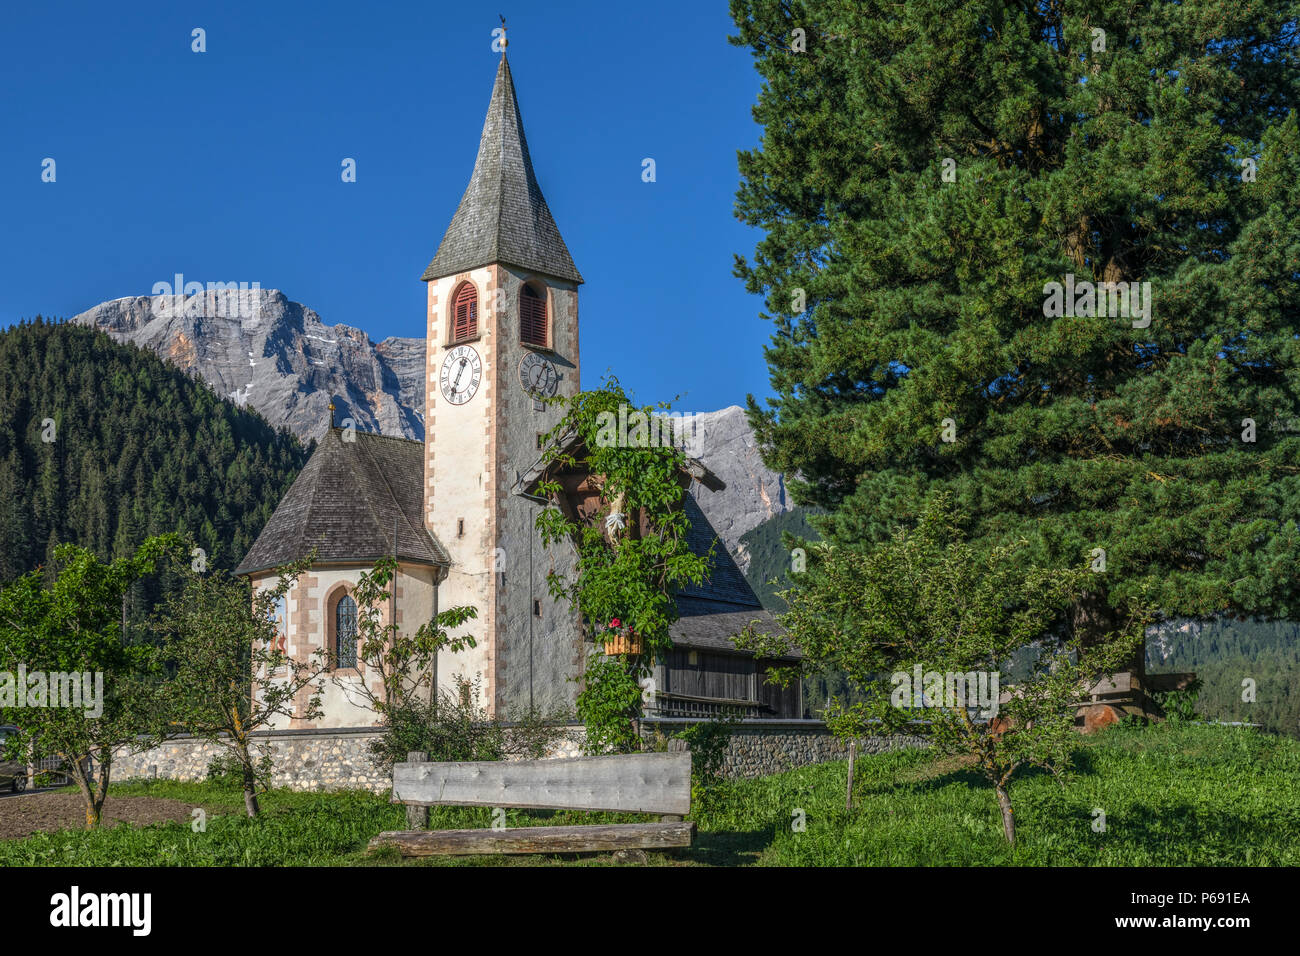 Oberhaus, Bolzano, Dolomites, Italy, Europe - Stock Image